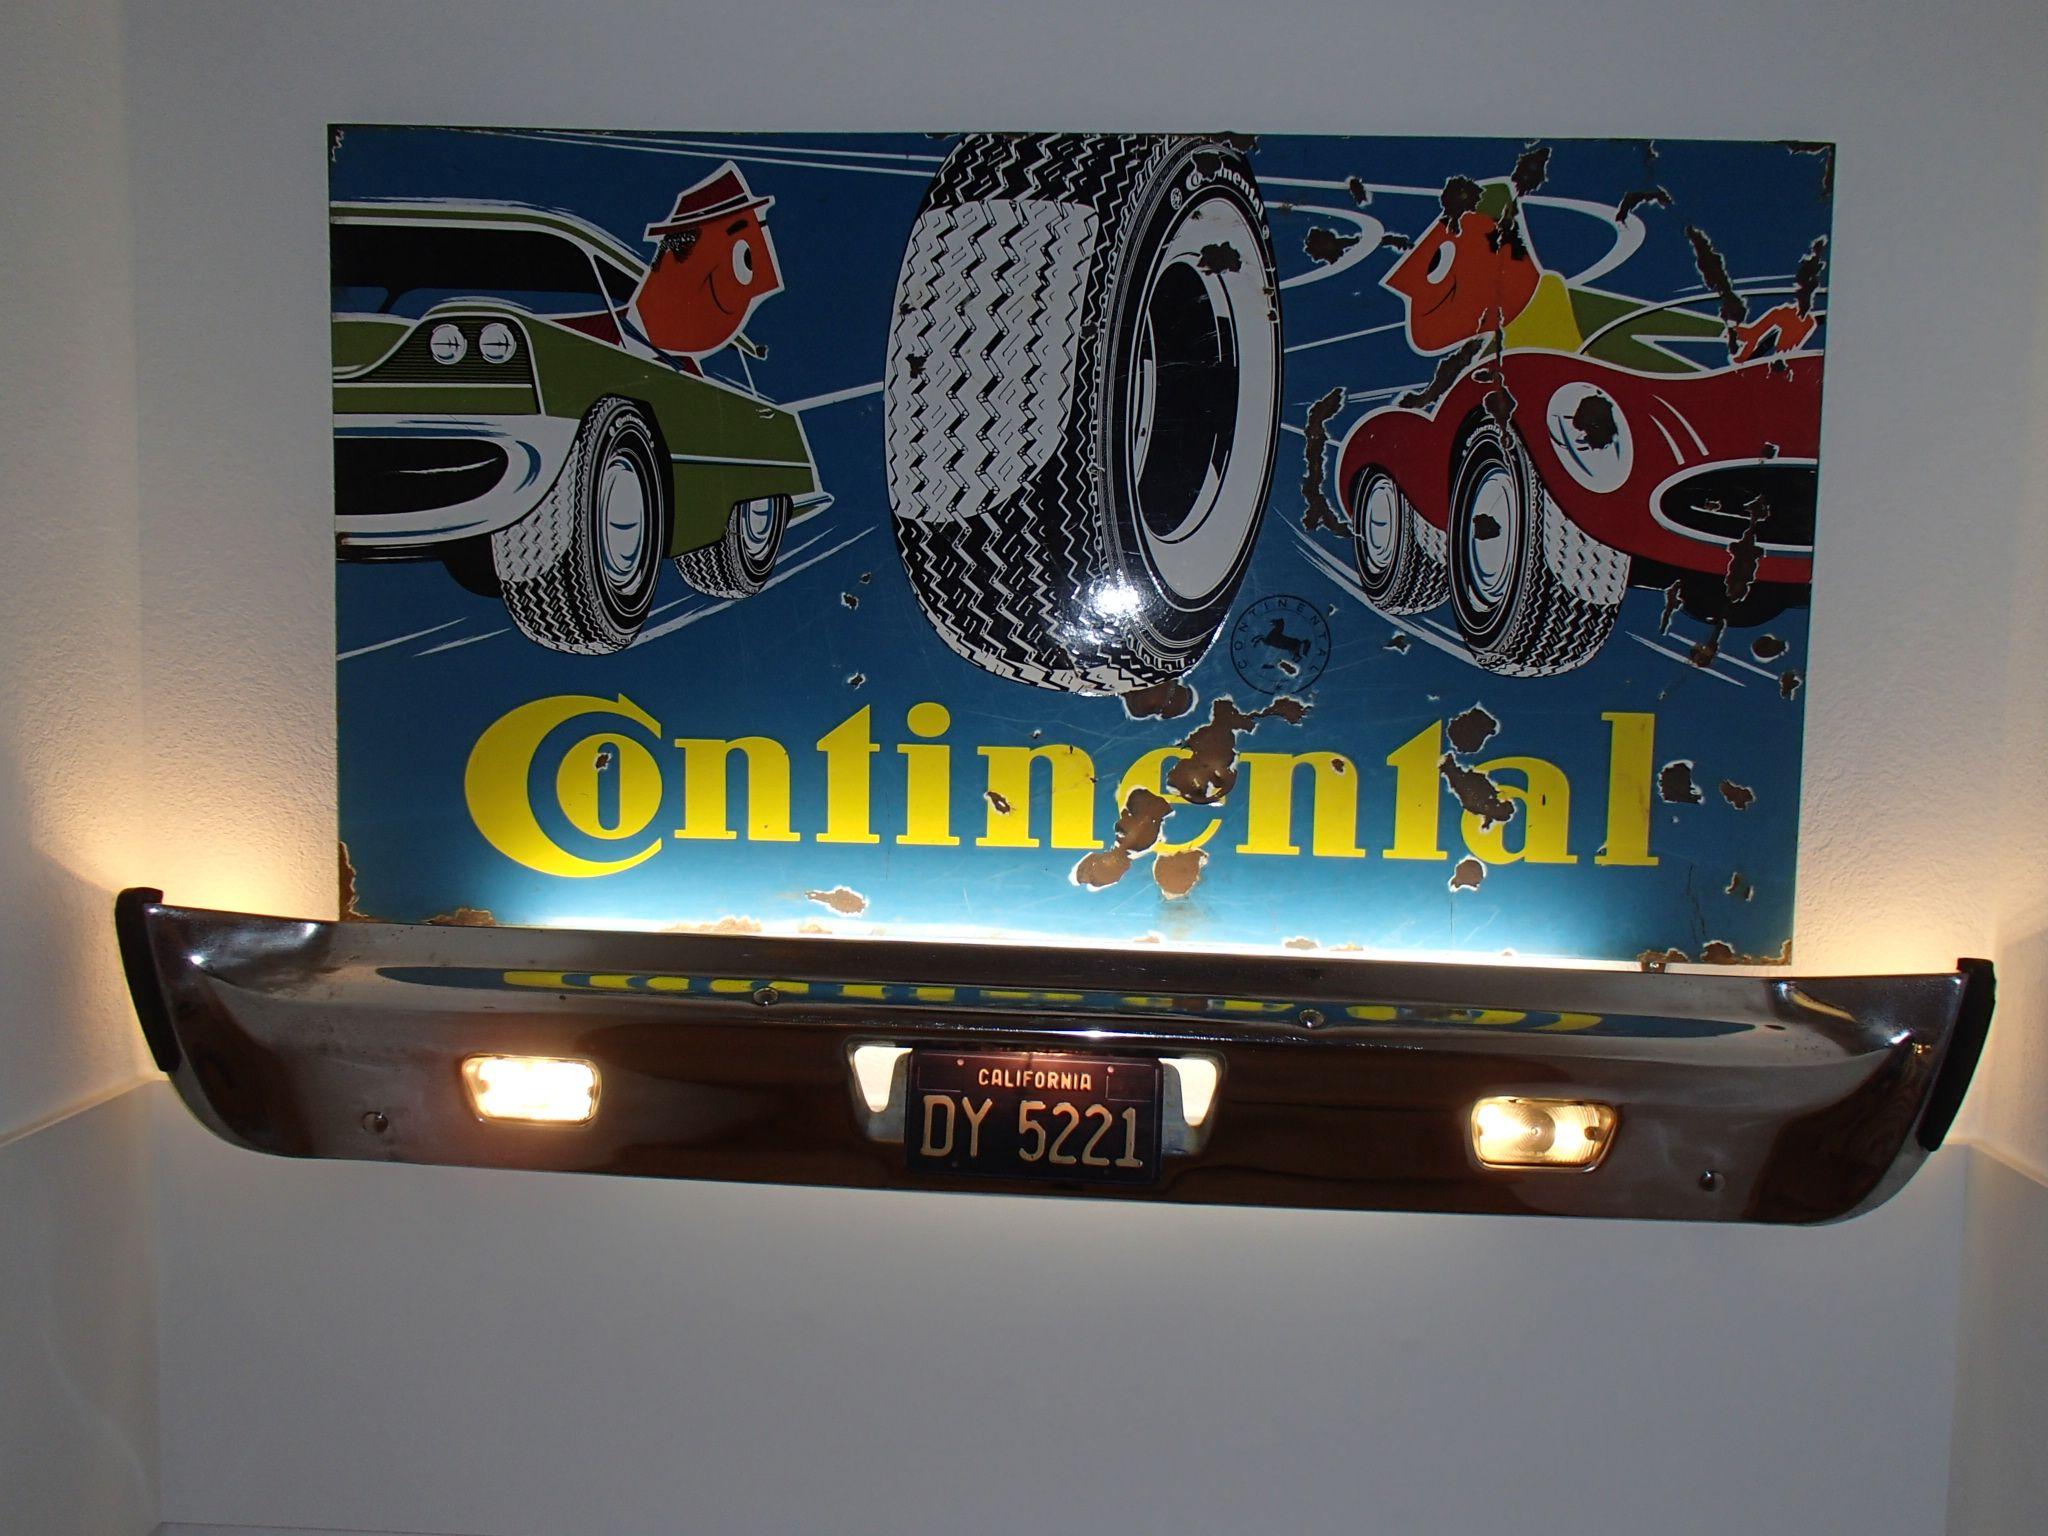 Lampen selbst gebaut aus weggeworfenem material leuchten - Cars deckenlampe ...